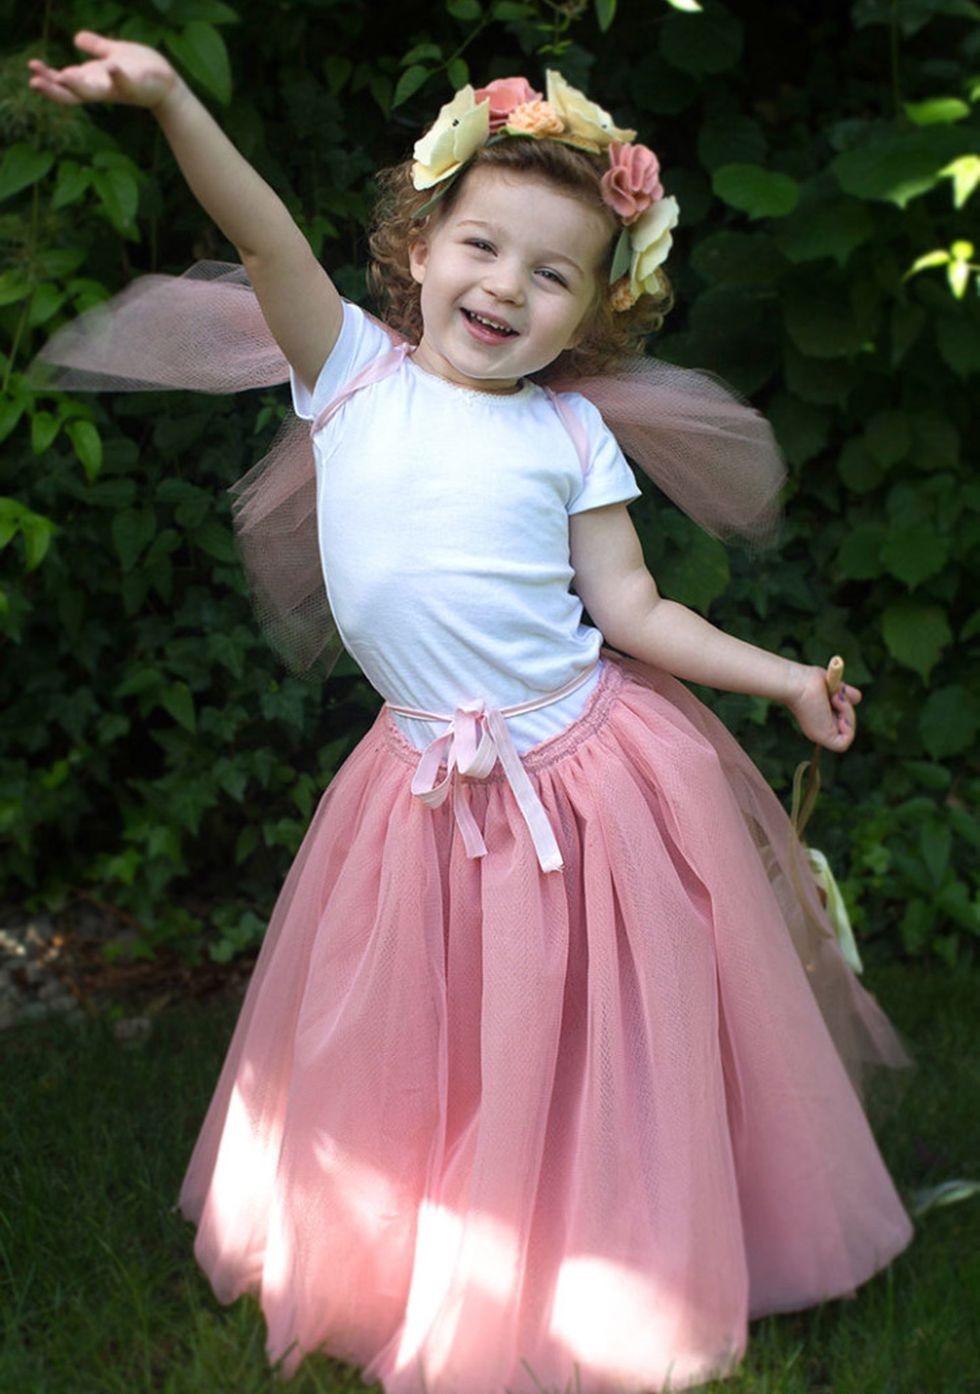 Diy fairy princess costume DIY Prettiest Princess Costume Ideas To Shine In Your Halloween Celebration